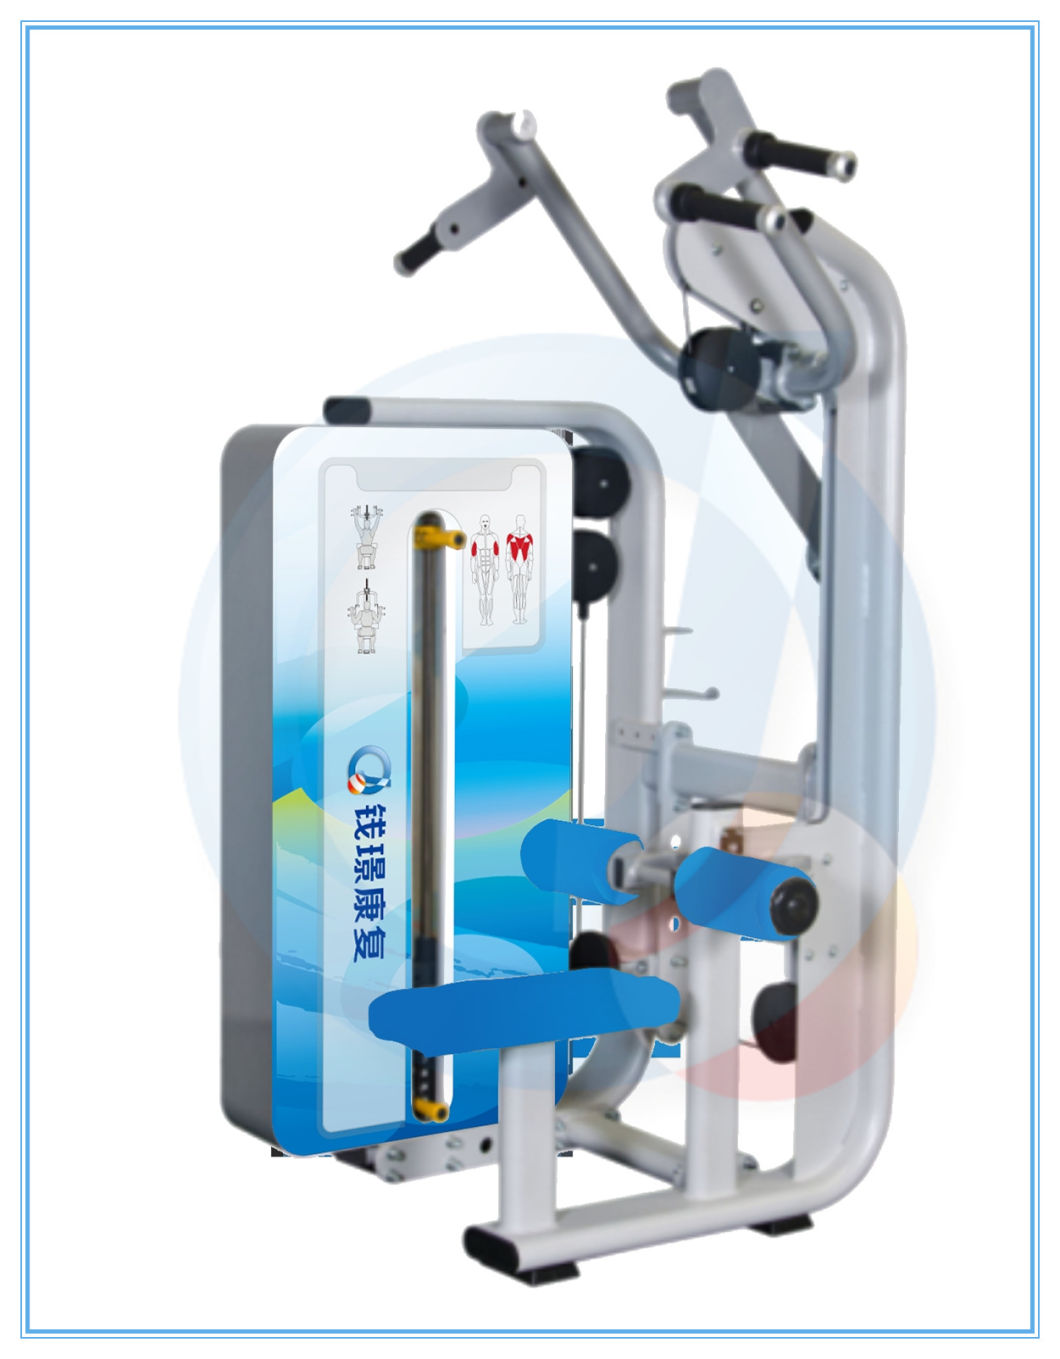 Aws109 Home Gym Rehabilitation Equipment Lat Pulldown Weight Machine